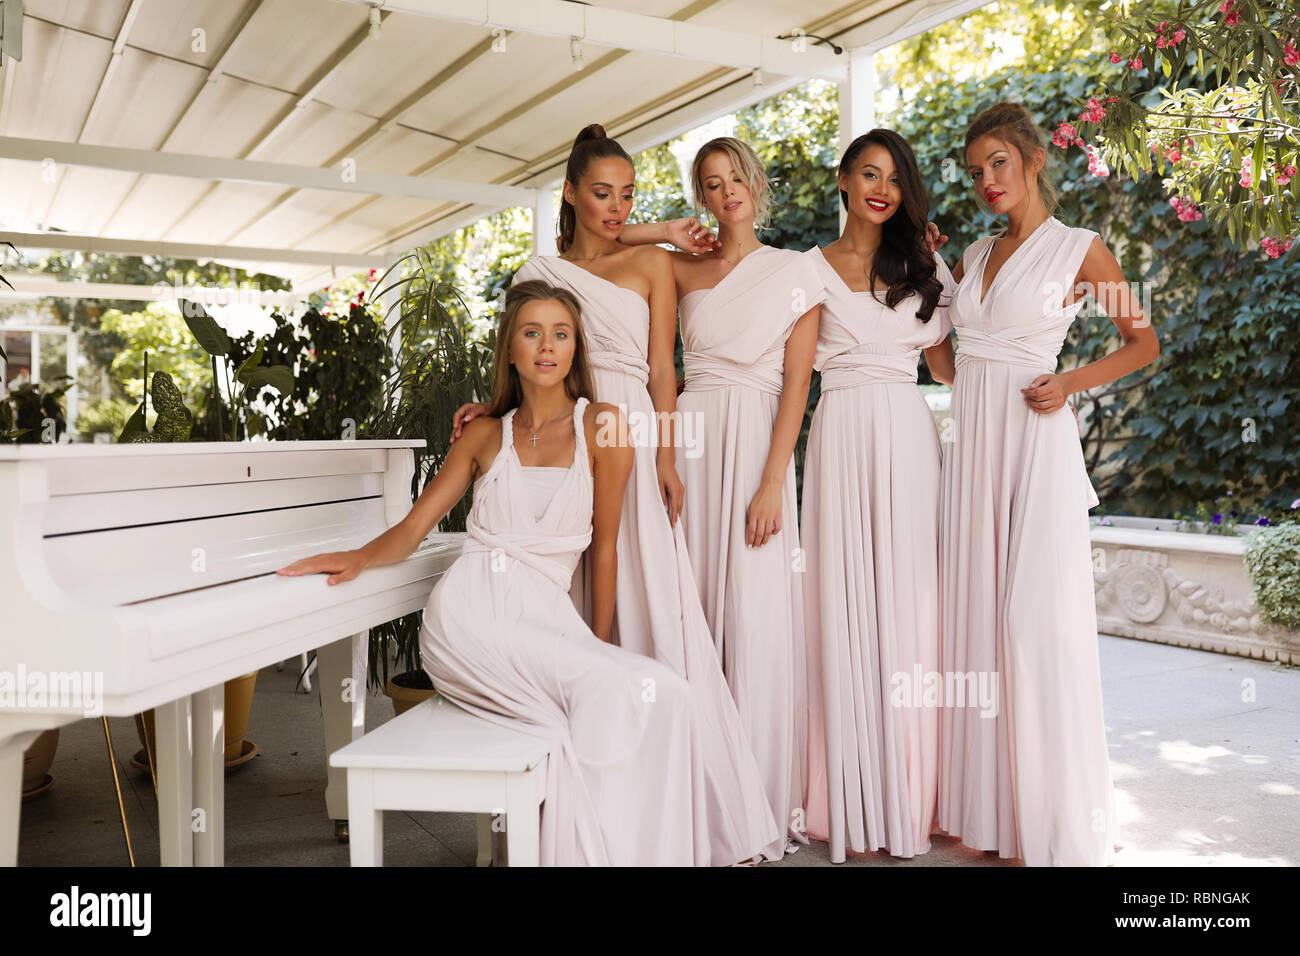 Tender feminine ladies in the light pink dresses standing